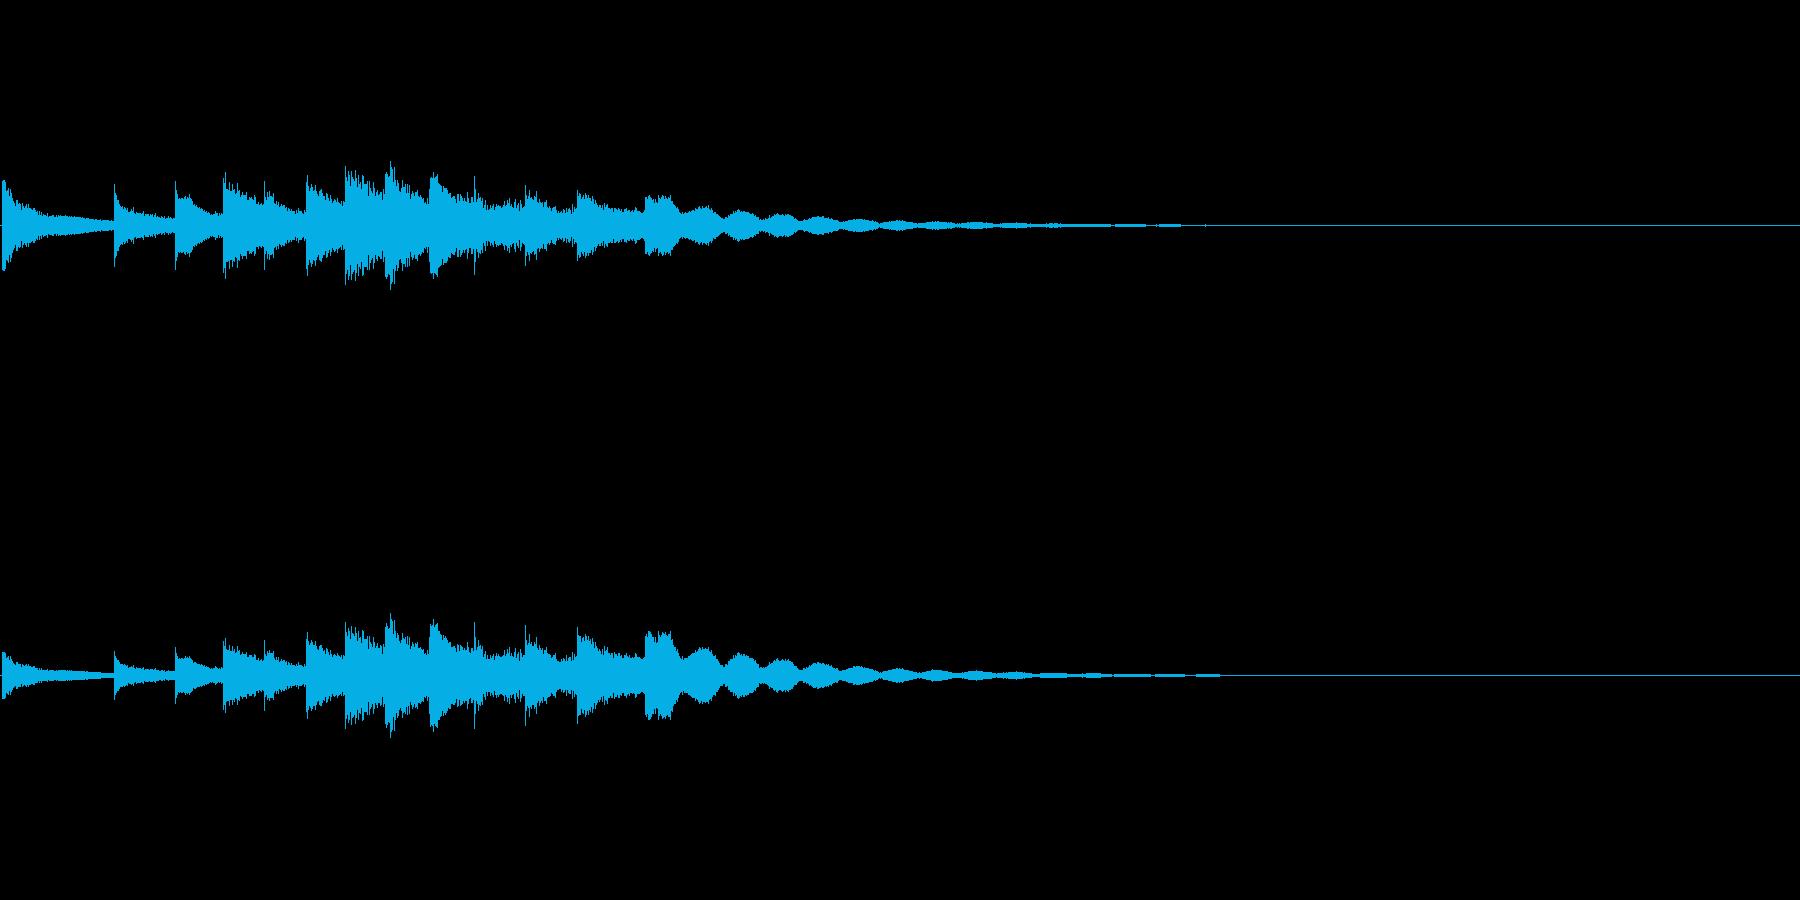 Anime アニメ風キラキラSE 2の再生済みの波形